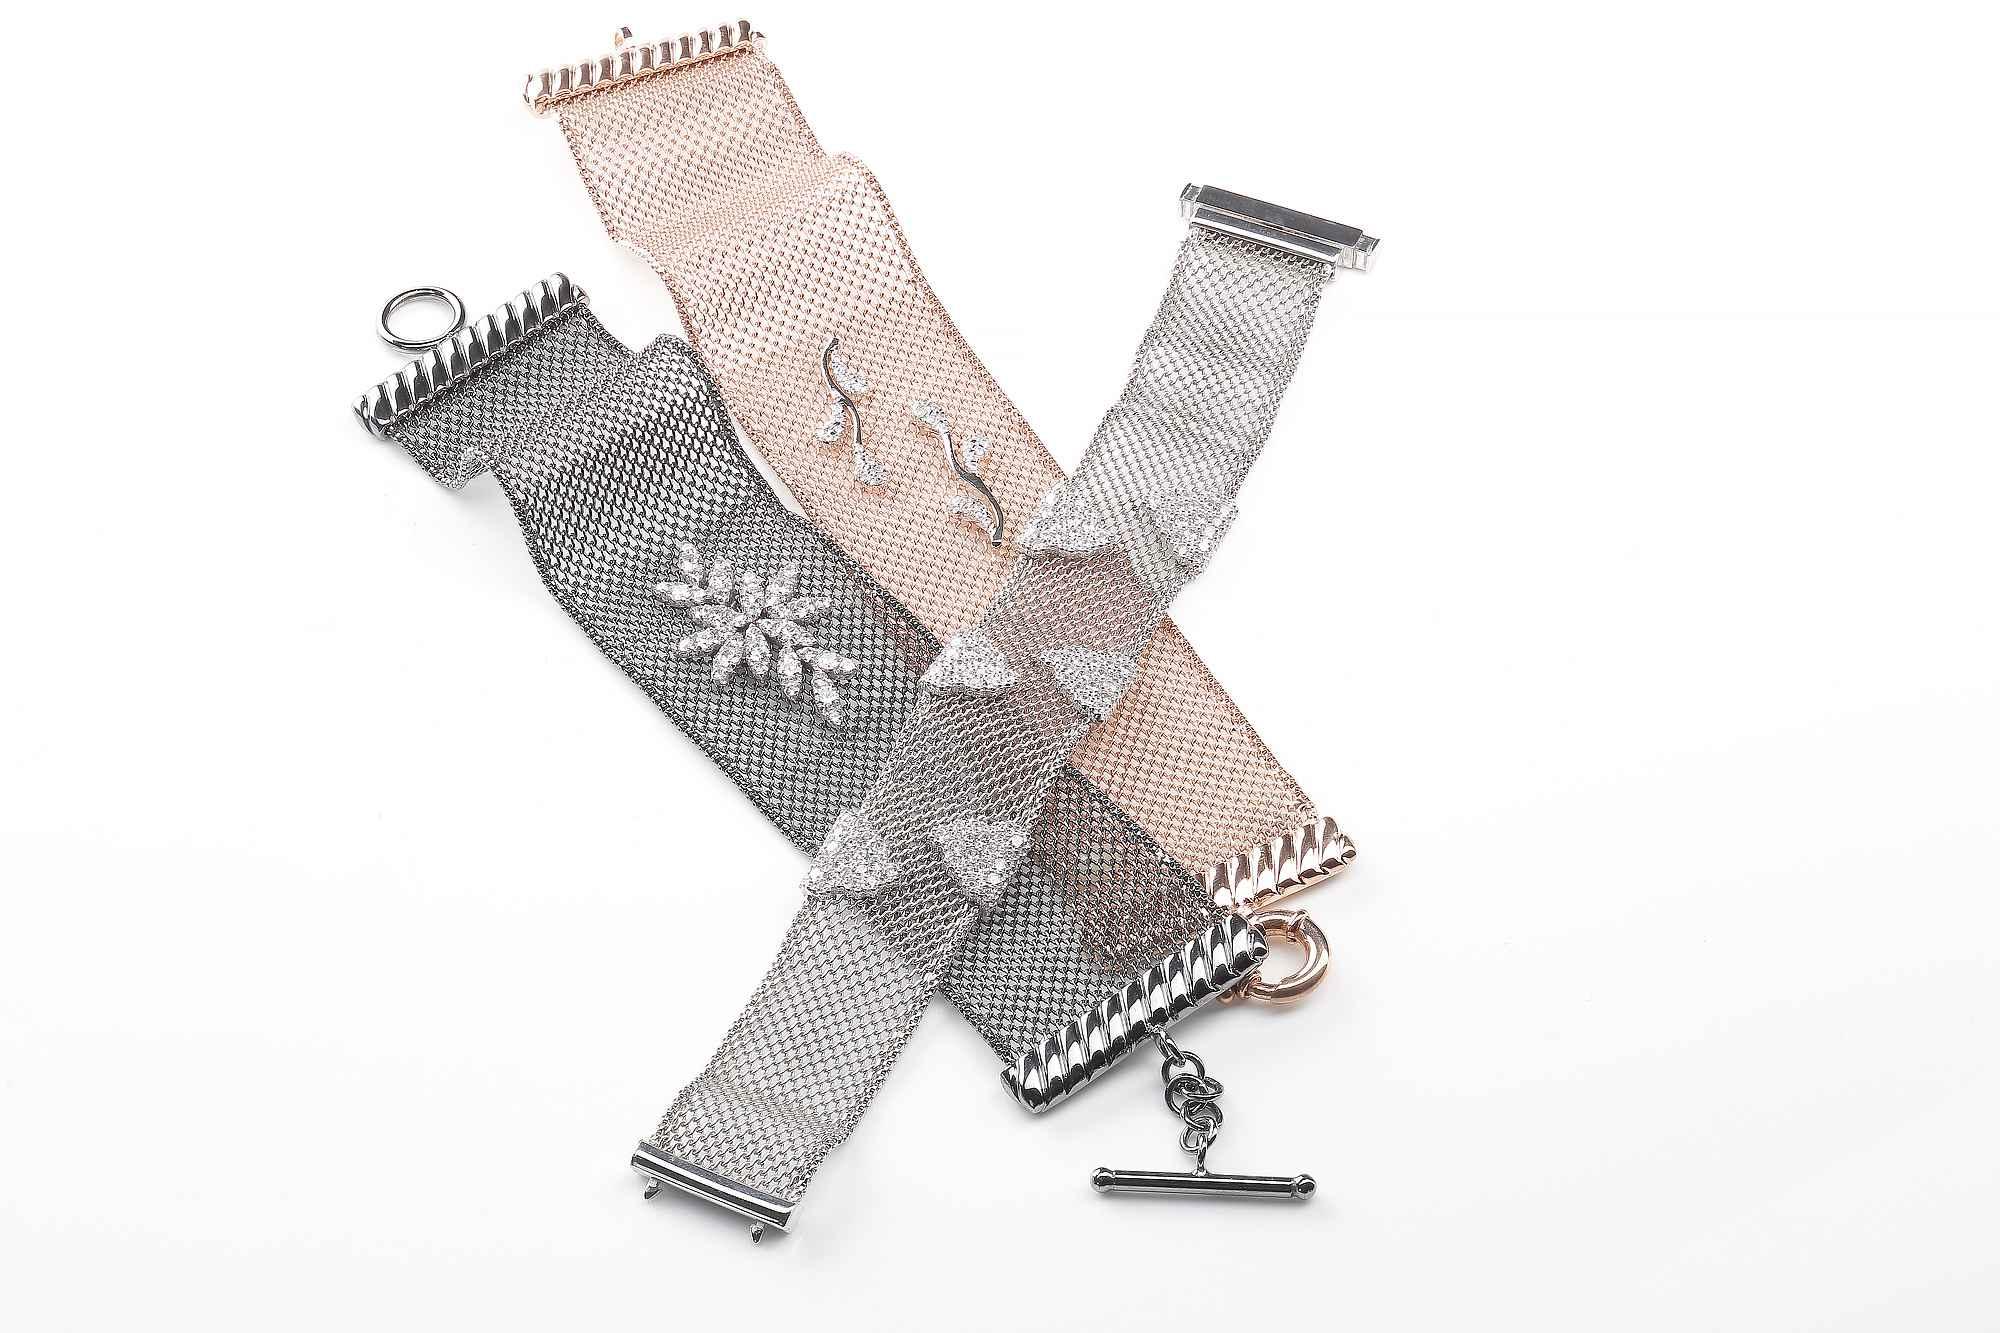 Parrini Gioielli - Bracelets